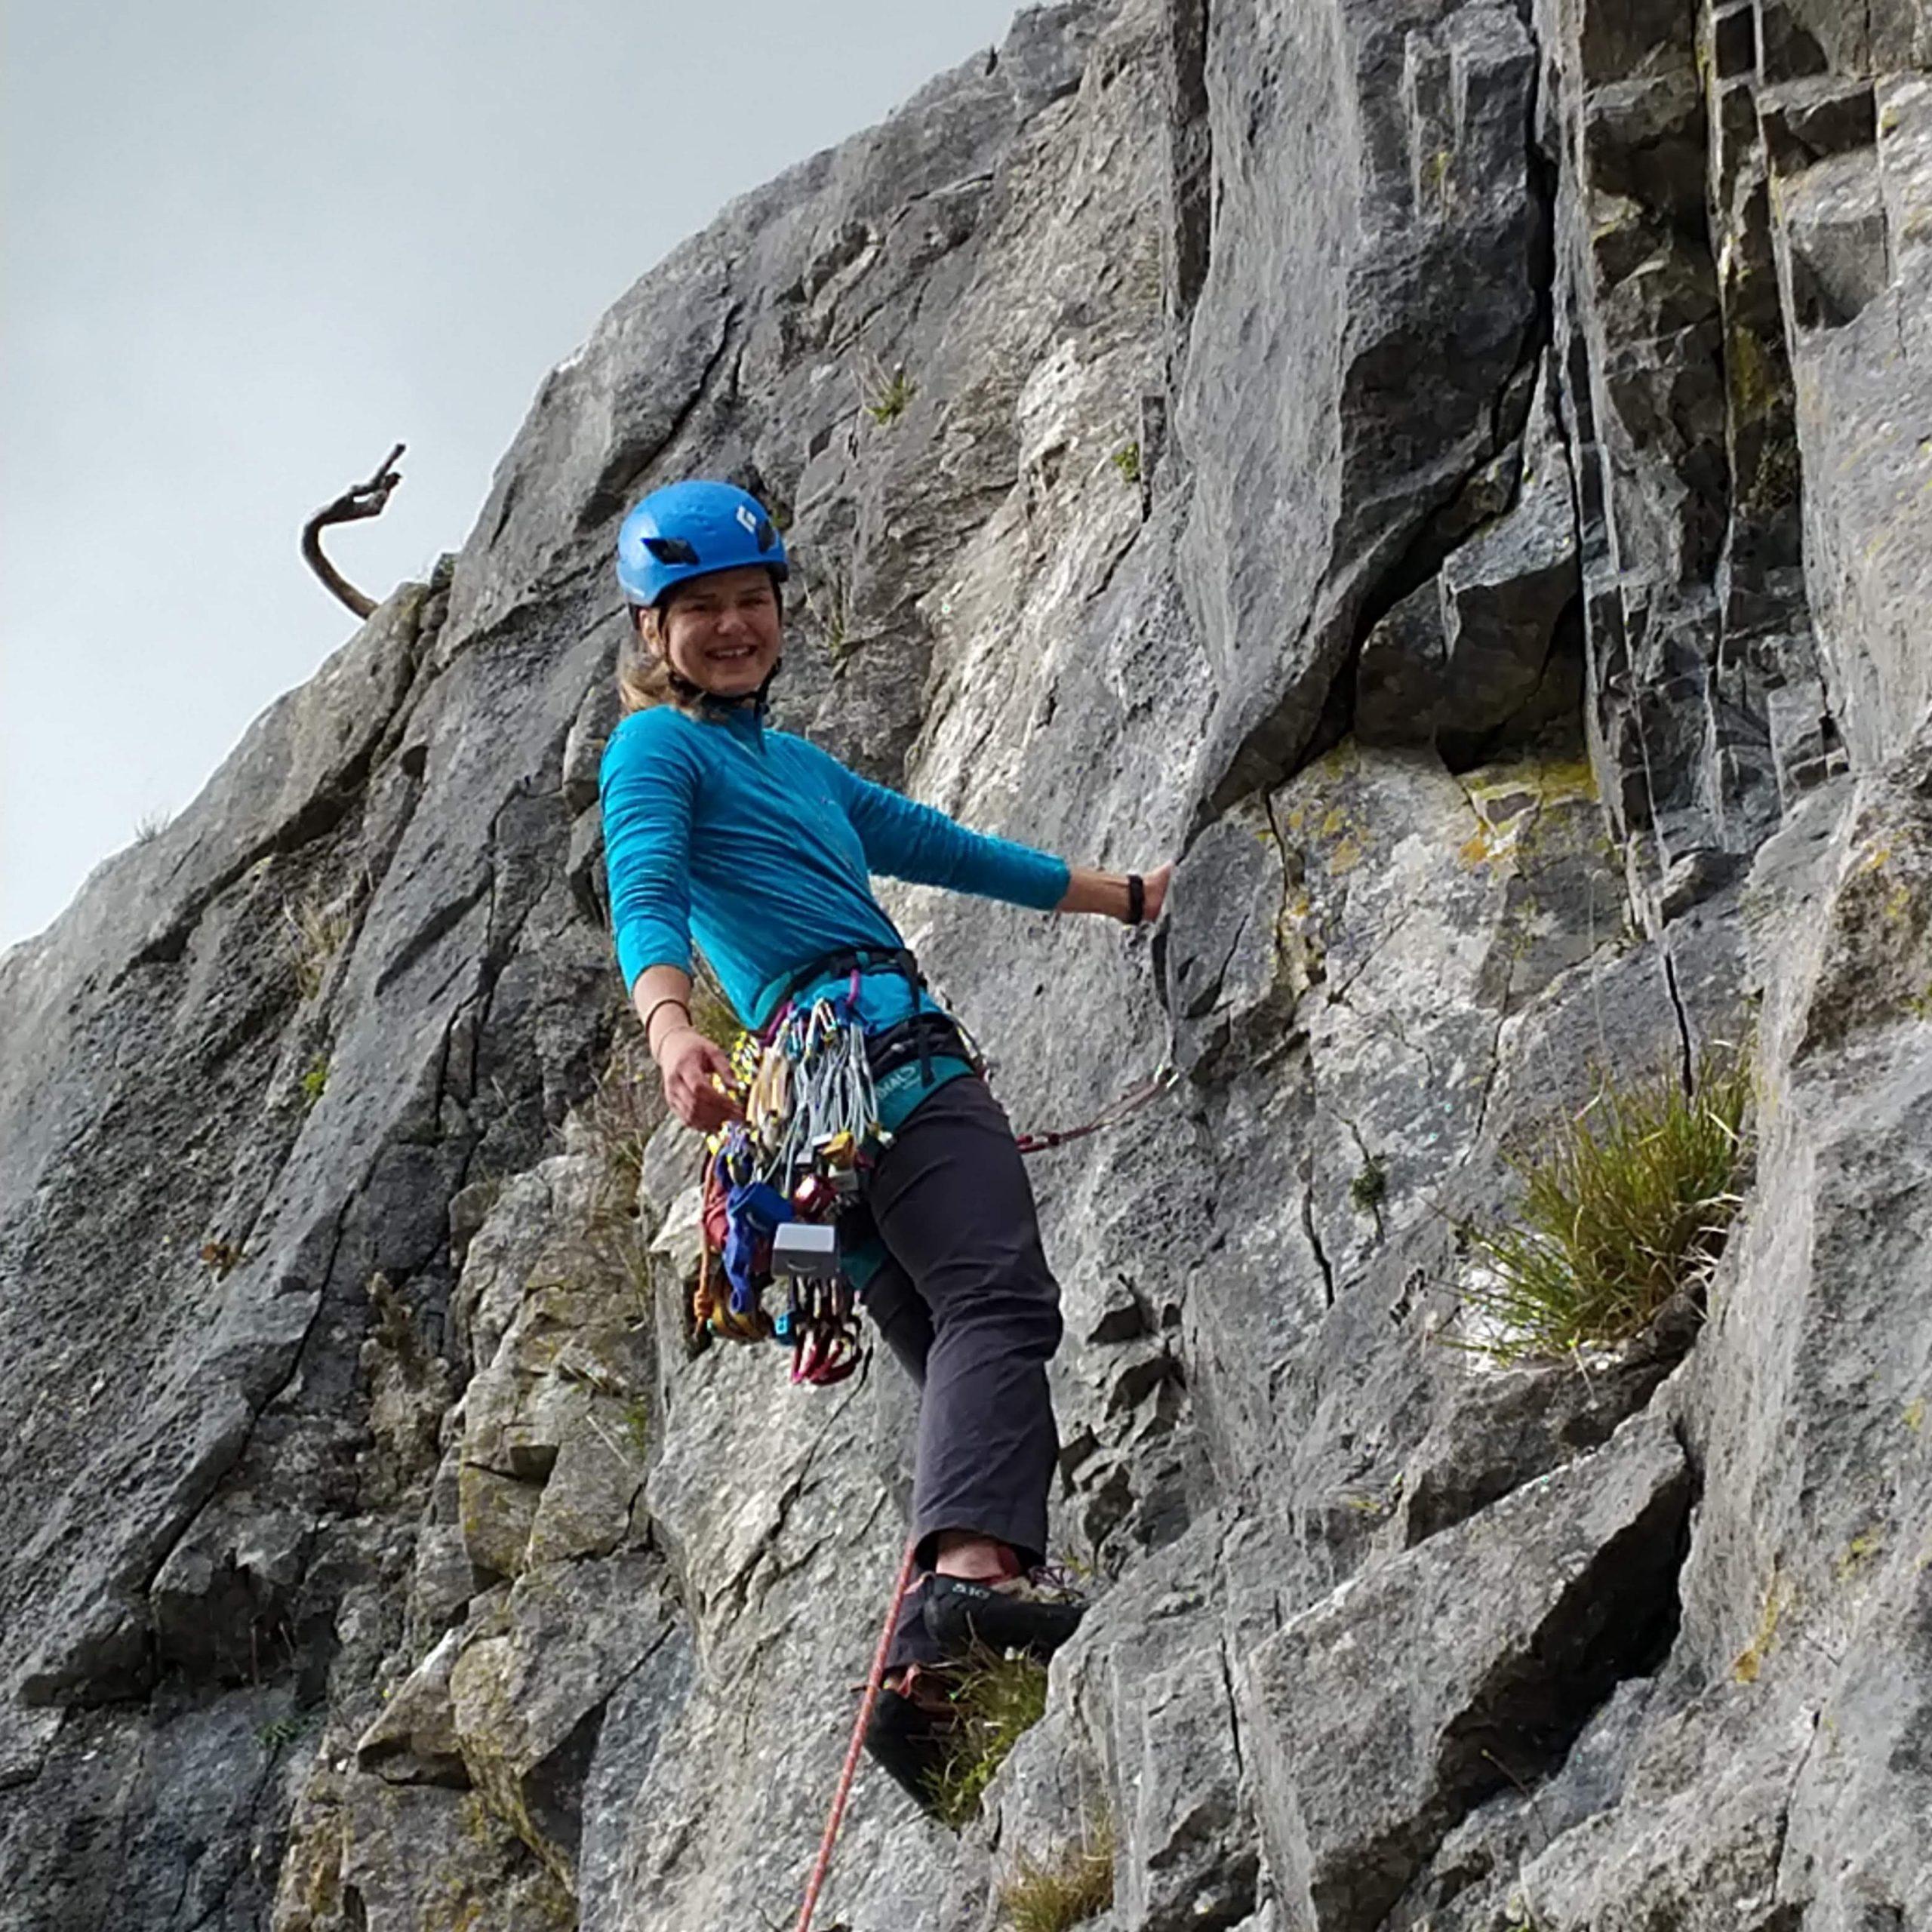 Rock Climbing Instructor training course